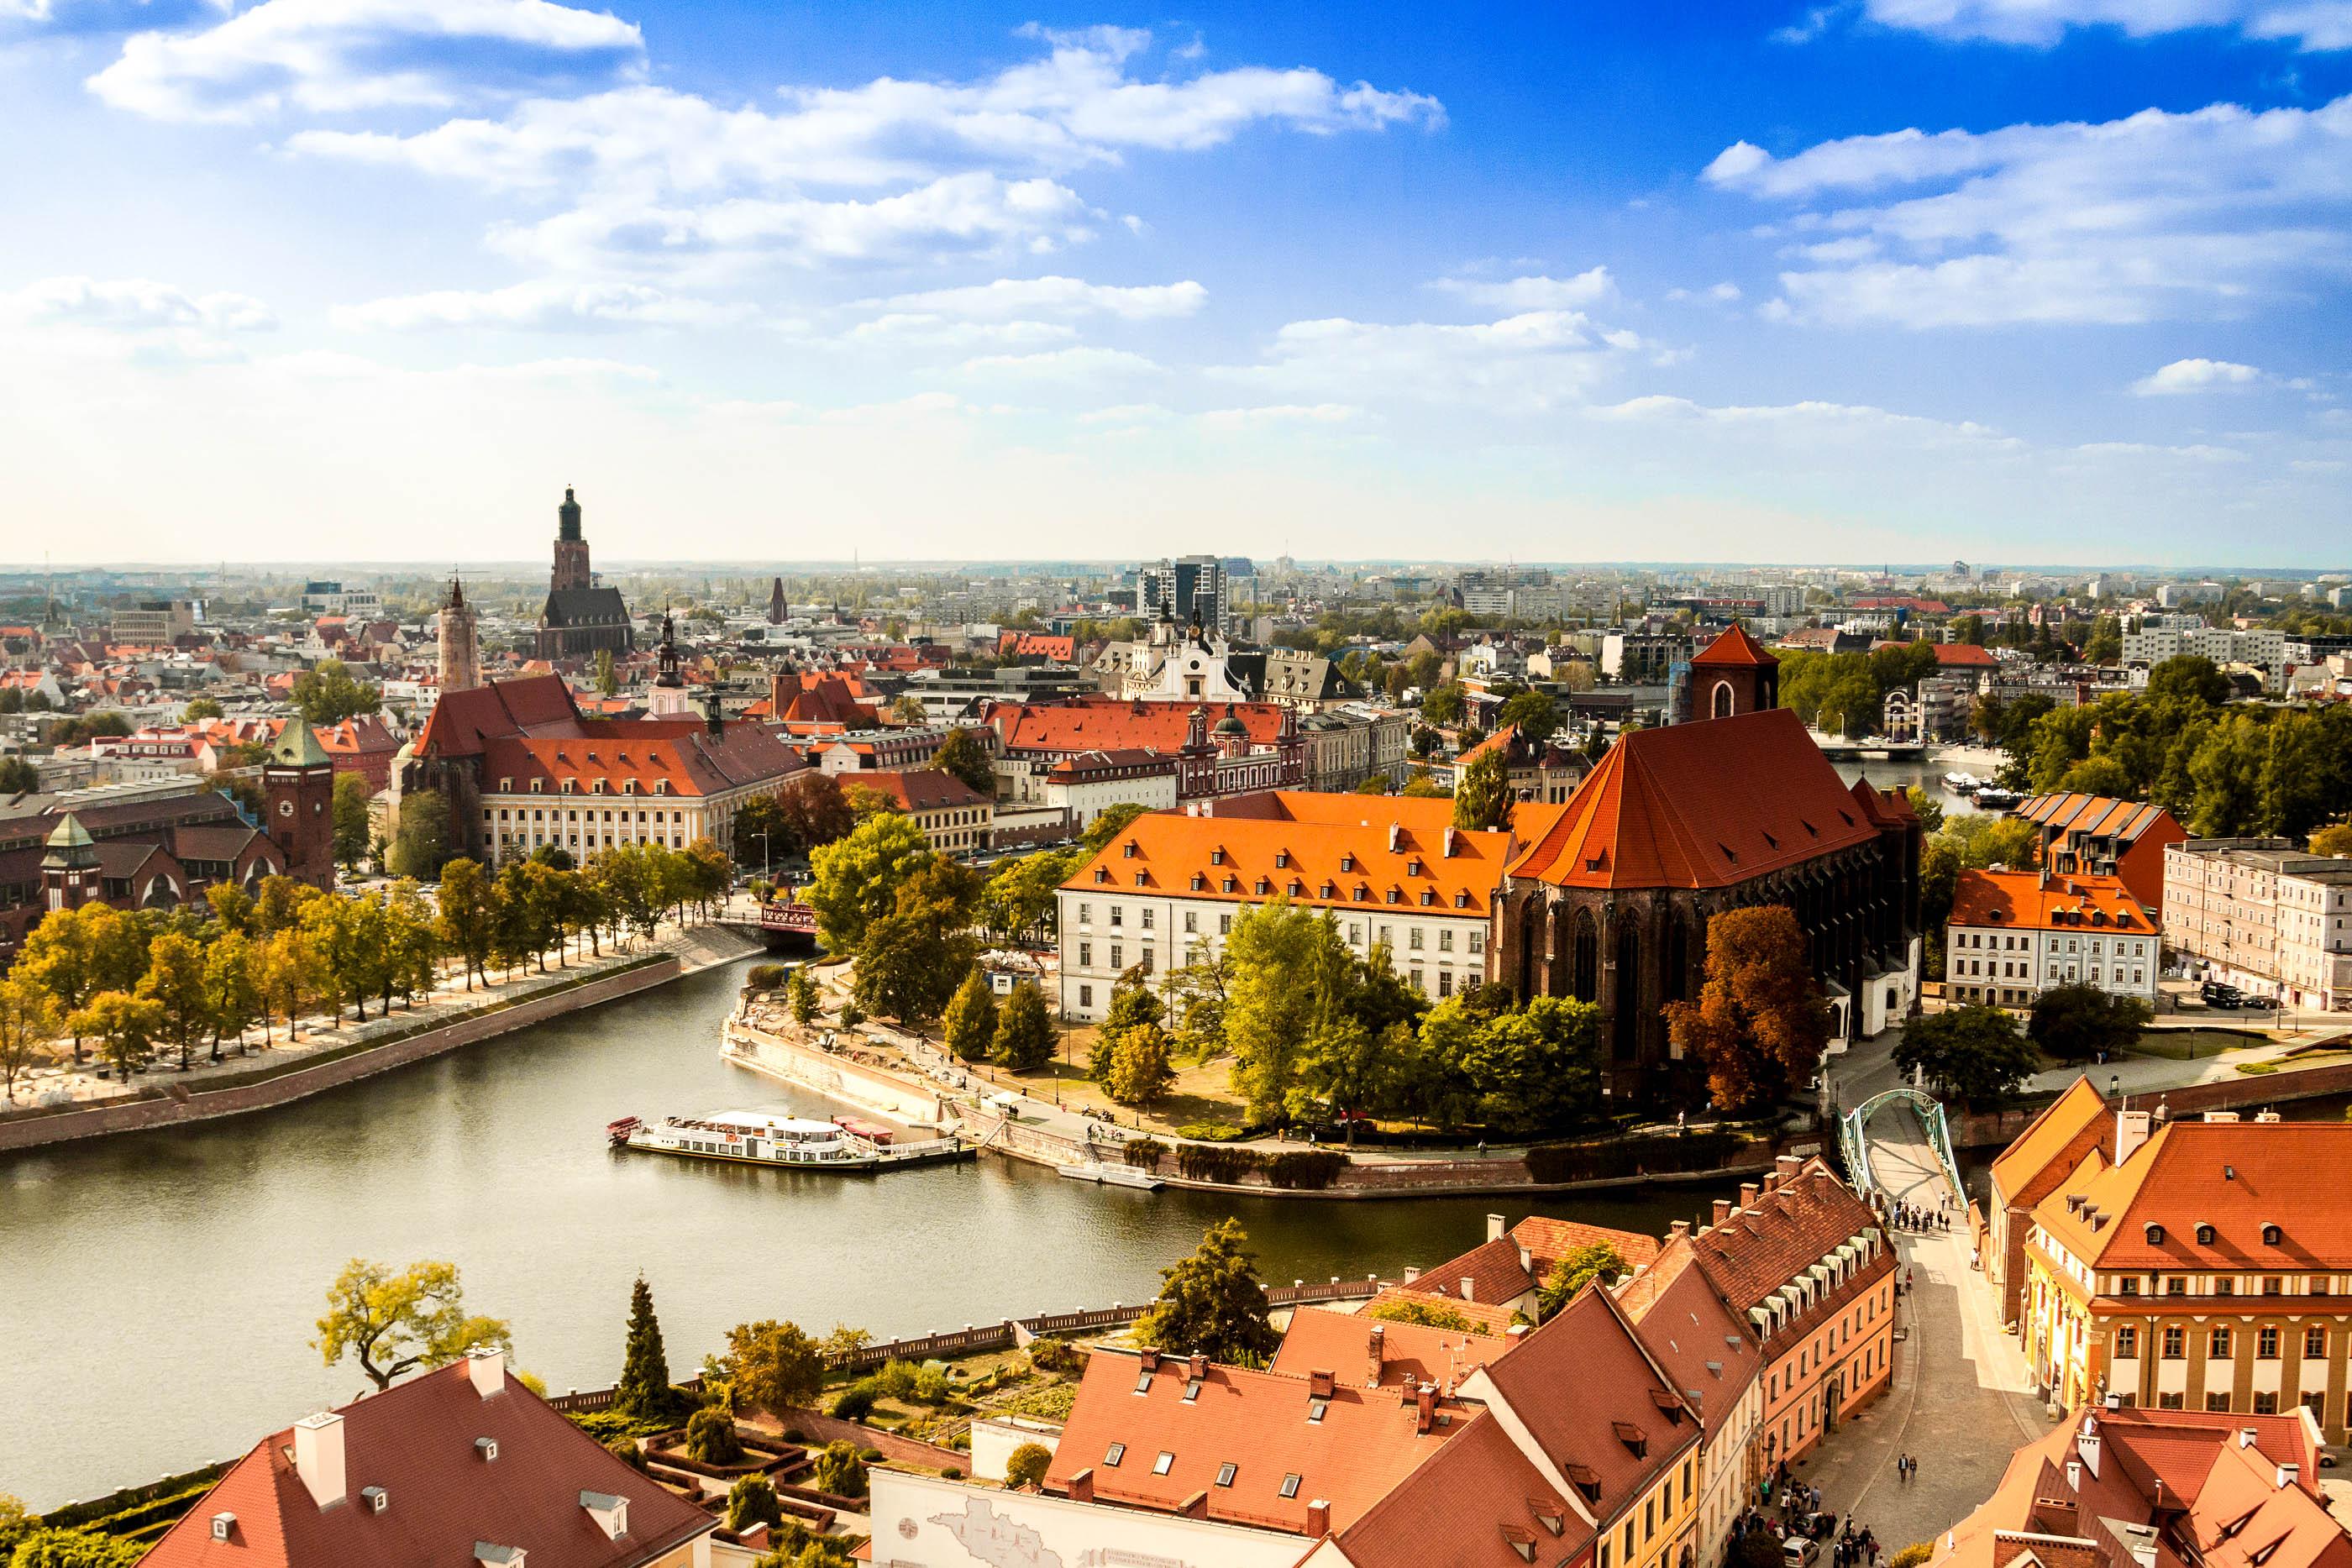 breslavia-je-jedan-od-najstarijih-gradova-secret-world